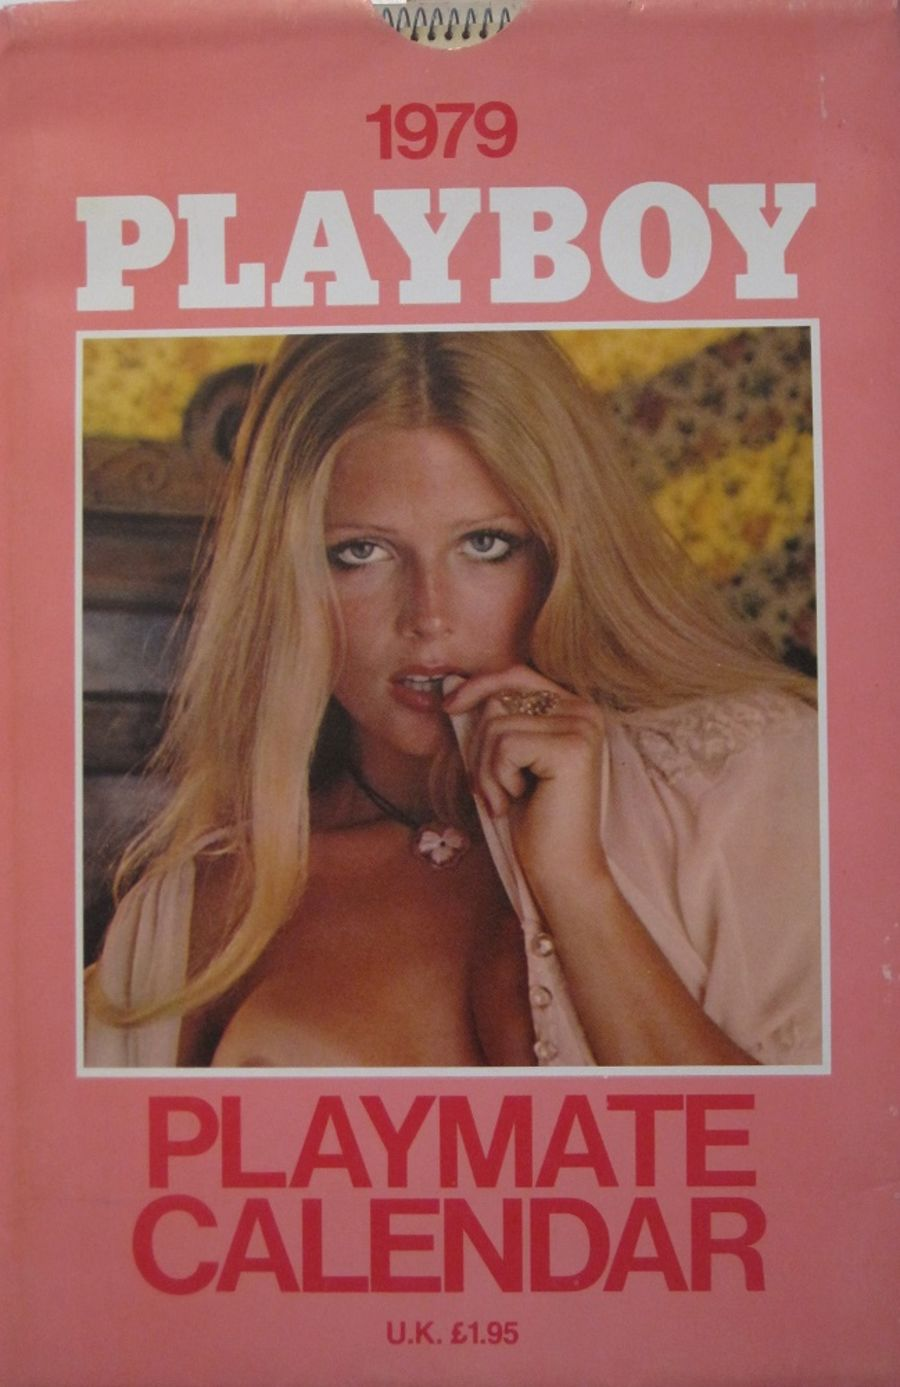 PLAYBOY PLAYMATE CALENDAR. 1979.